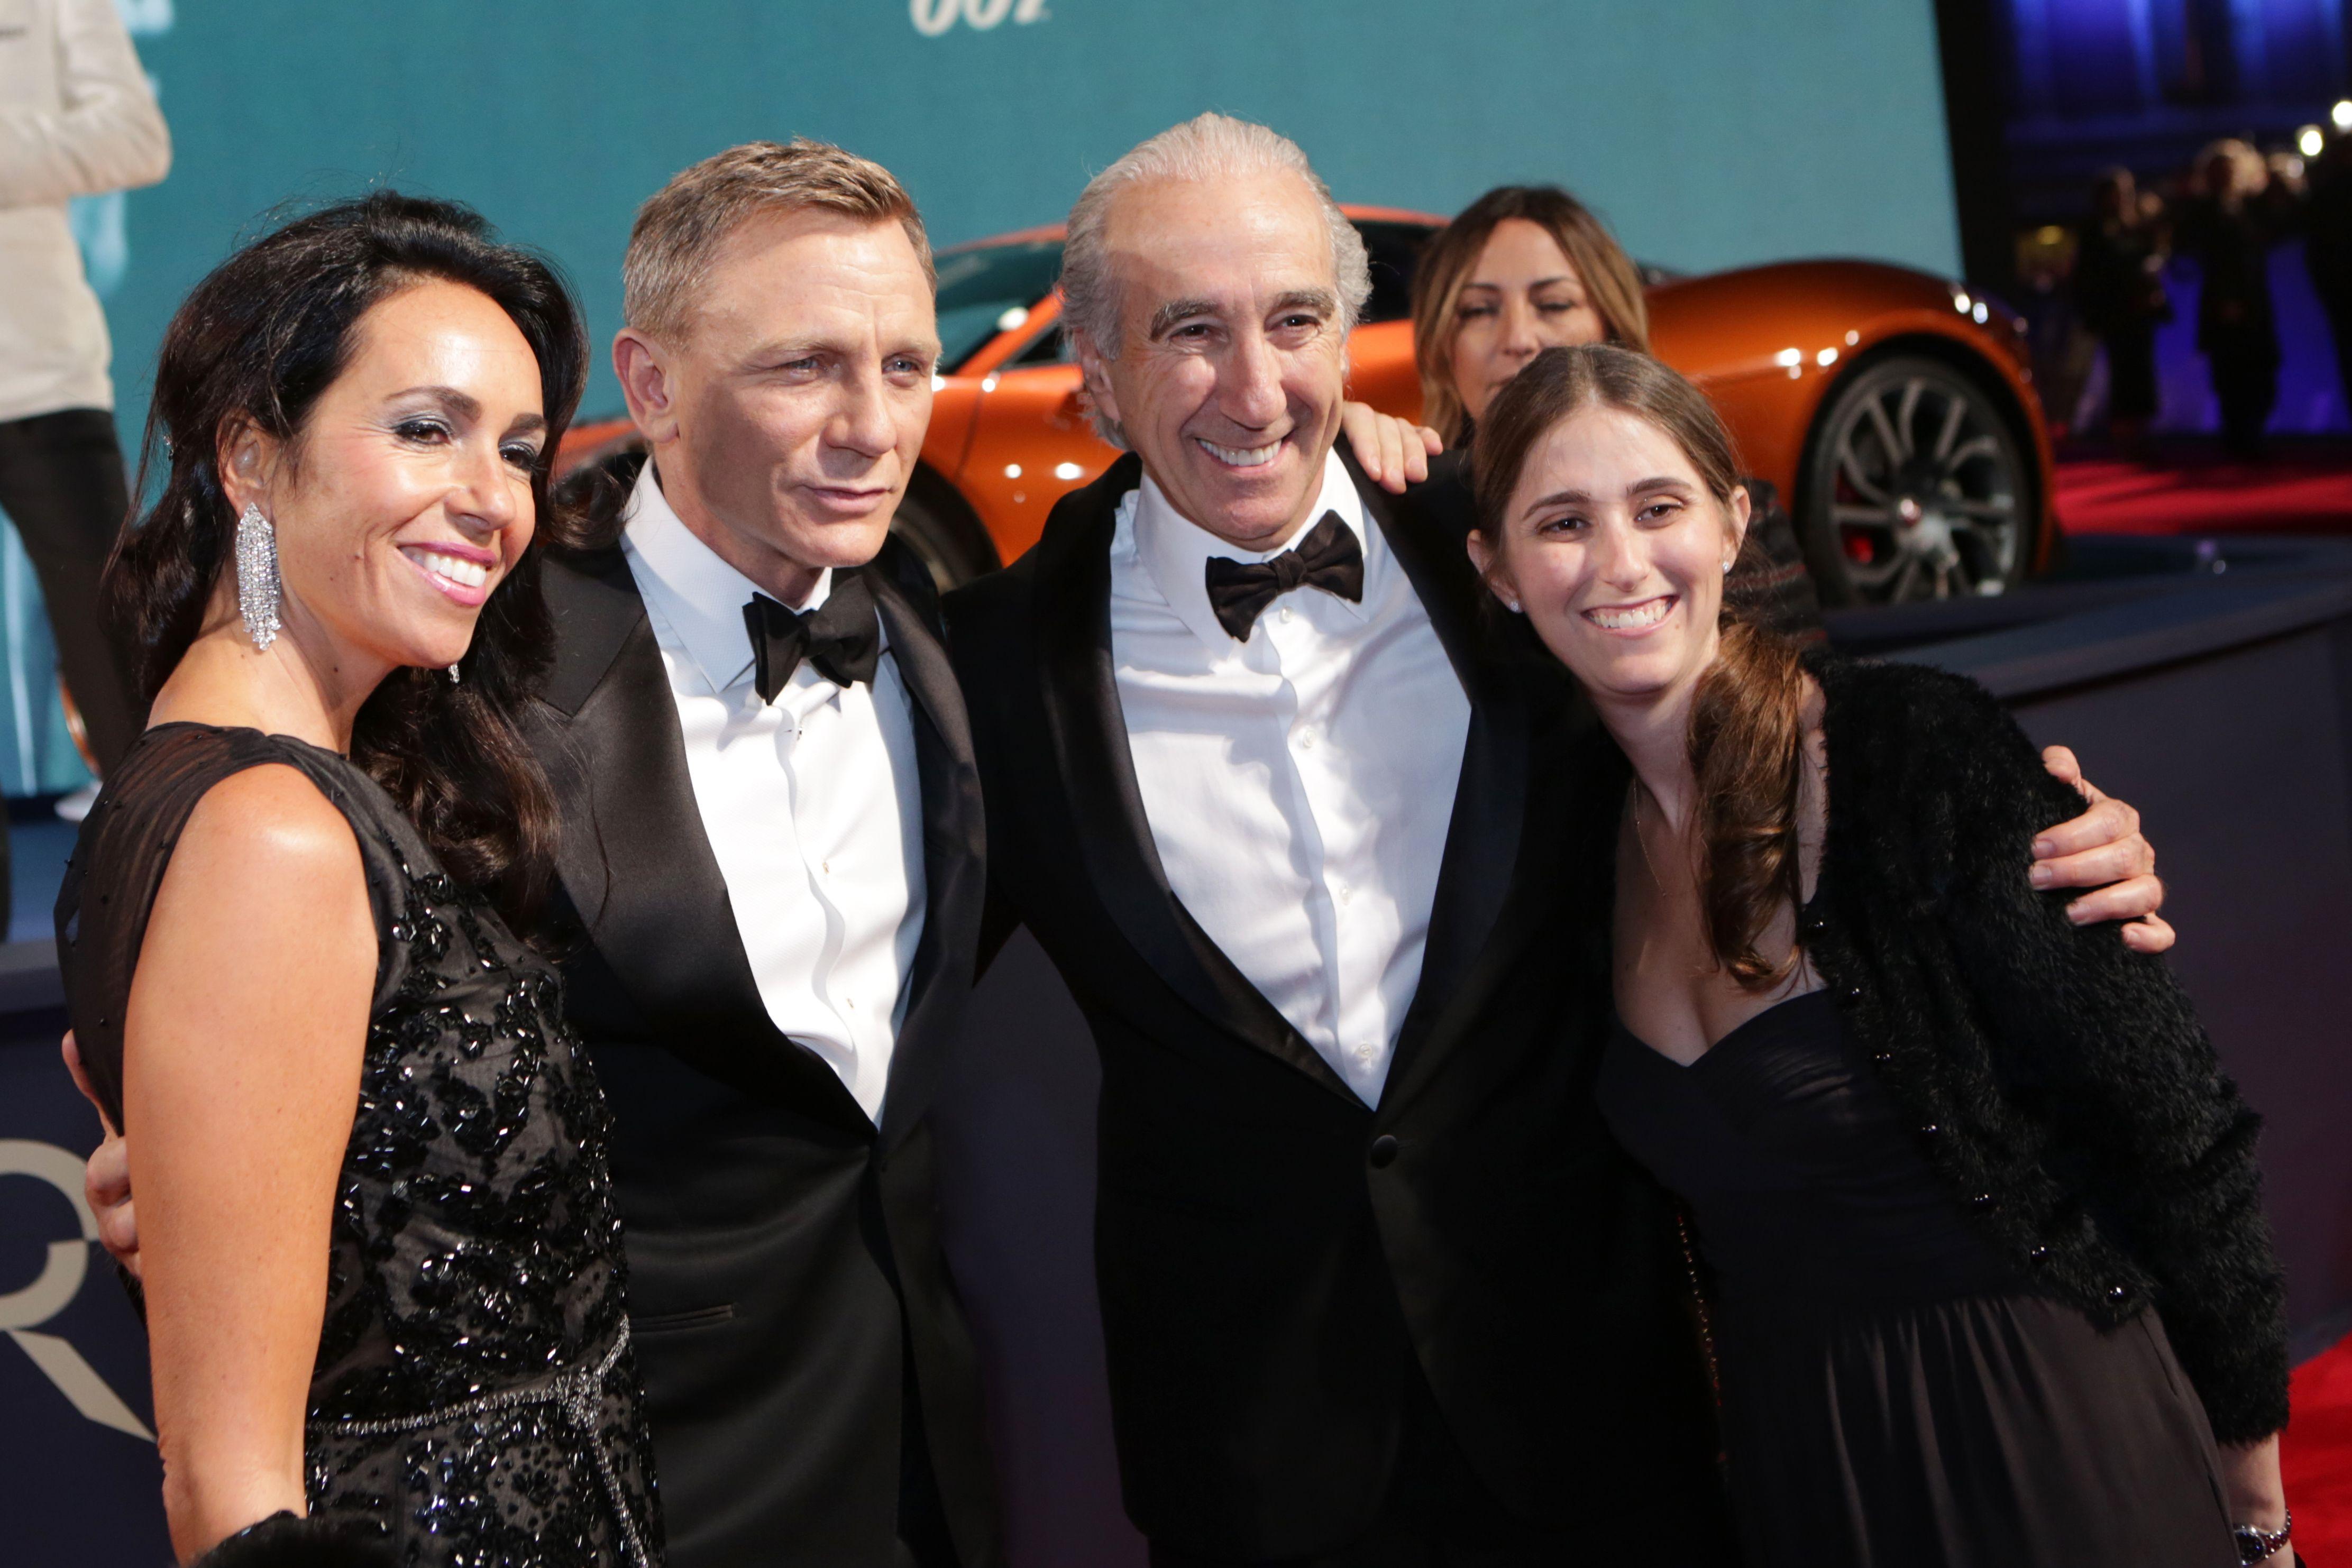 Nadine Barber, Daniel Craig, Gary Barber and guestJames Bond 'Spectre' CTBF film premiere, Royal Albert Hall, London, Britain - 26 Oct 2015